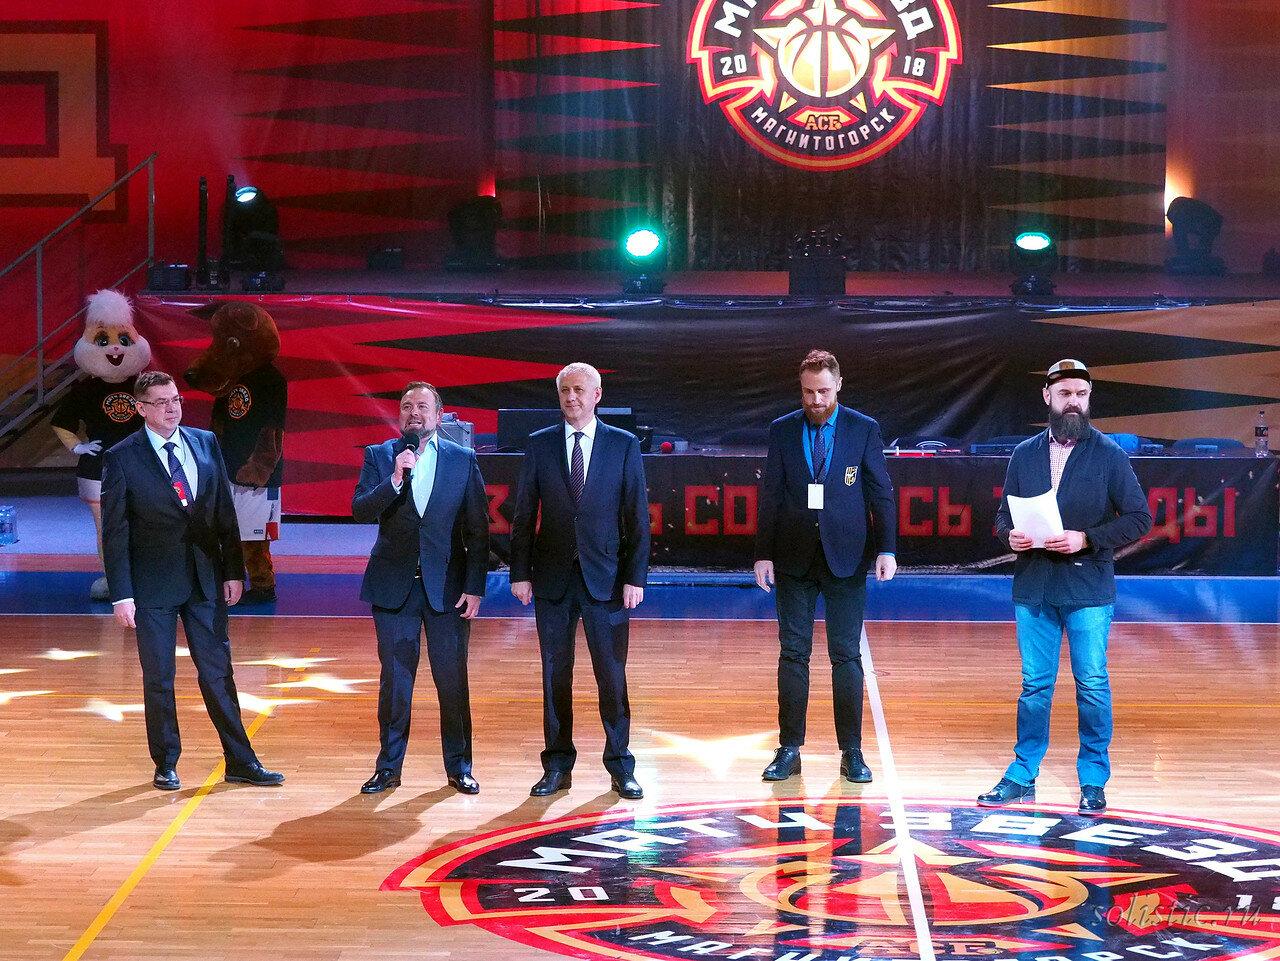 32 Матч звезд АСБ 2018 (ассоциации студенческого баскетбола)